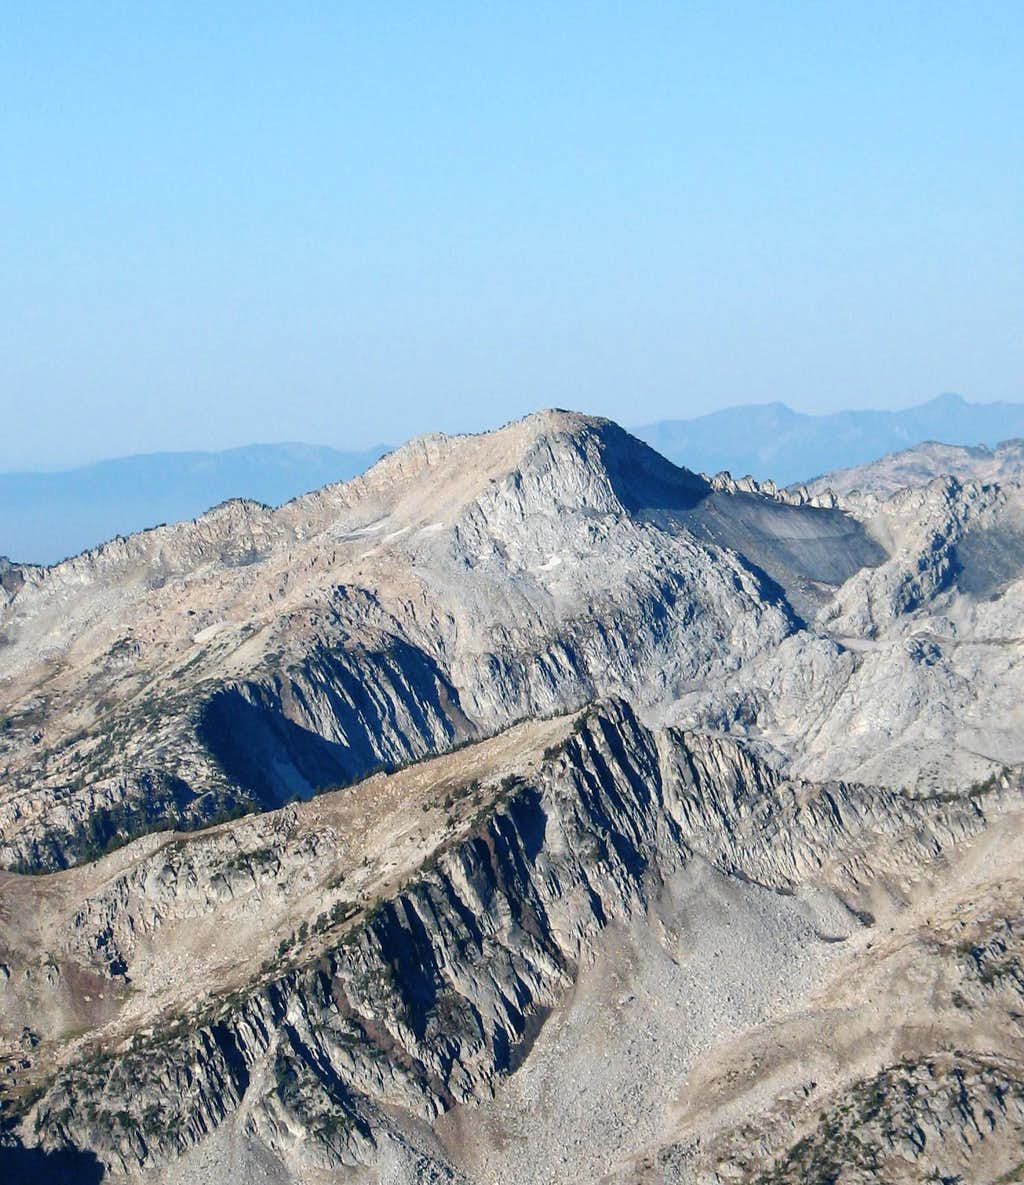 Glacier Peak from Pete's Point